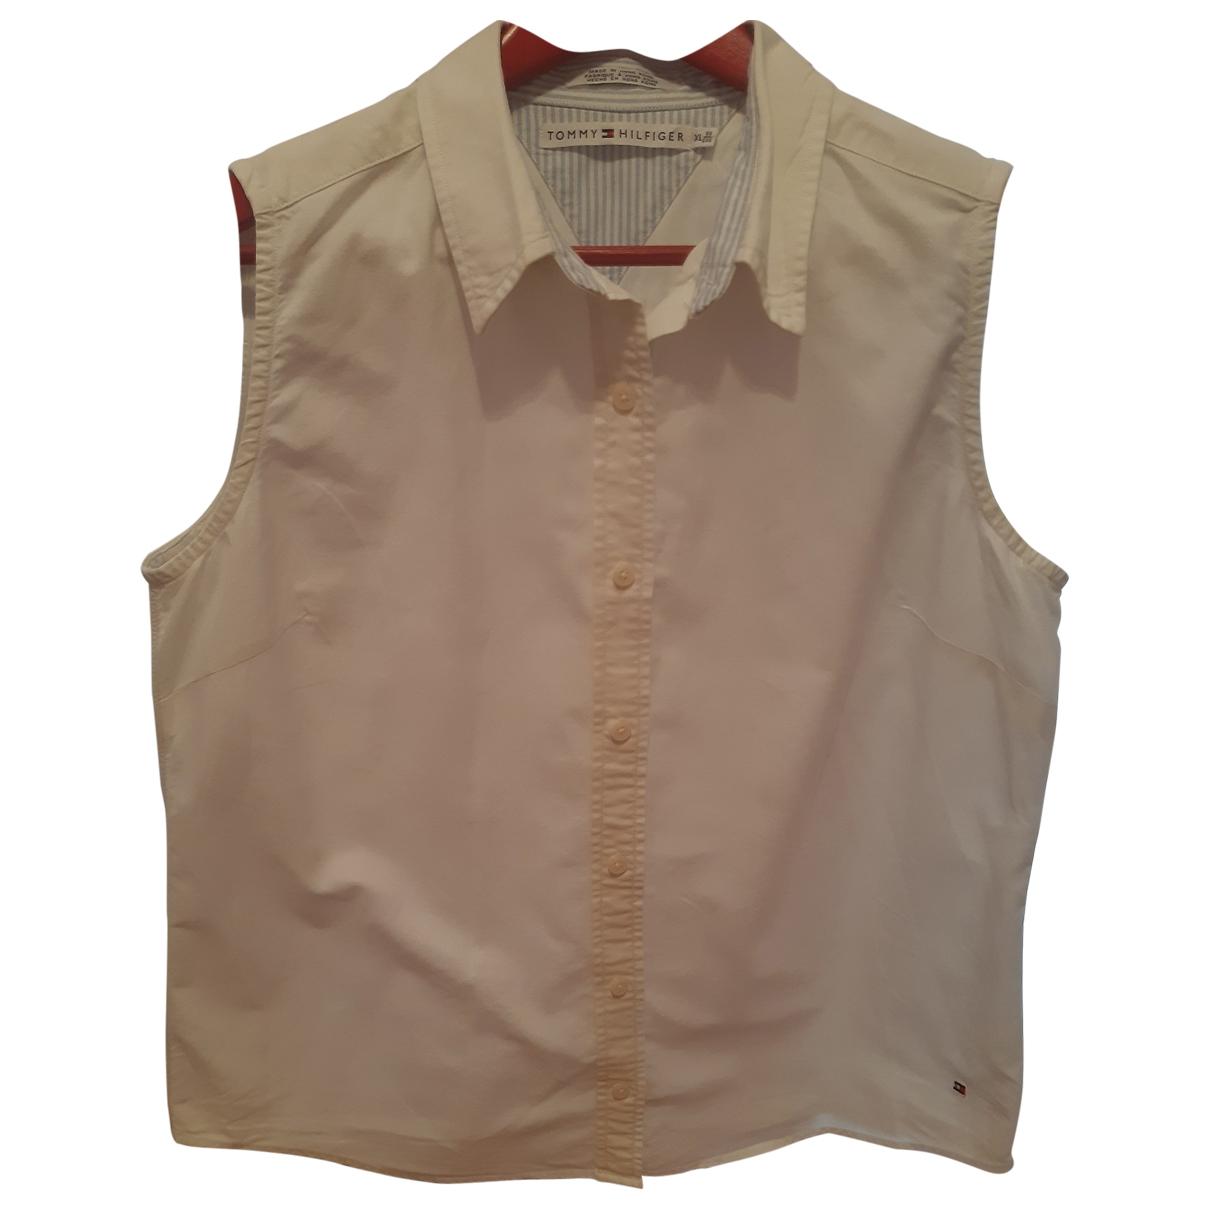 Camiseta sin mangas Tommy Hilfiger